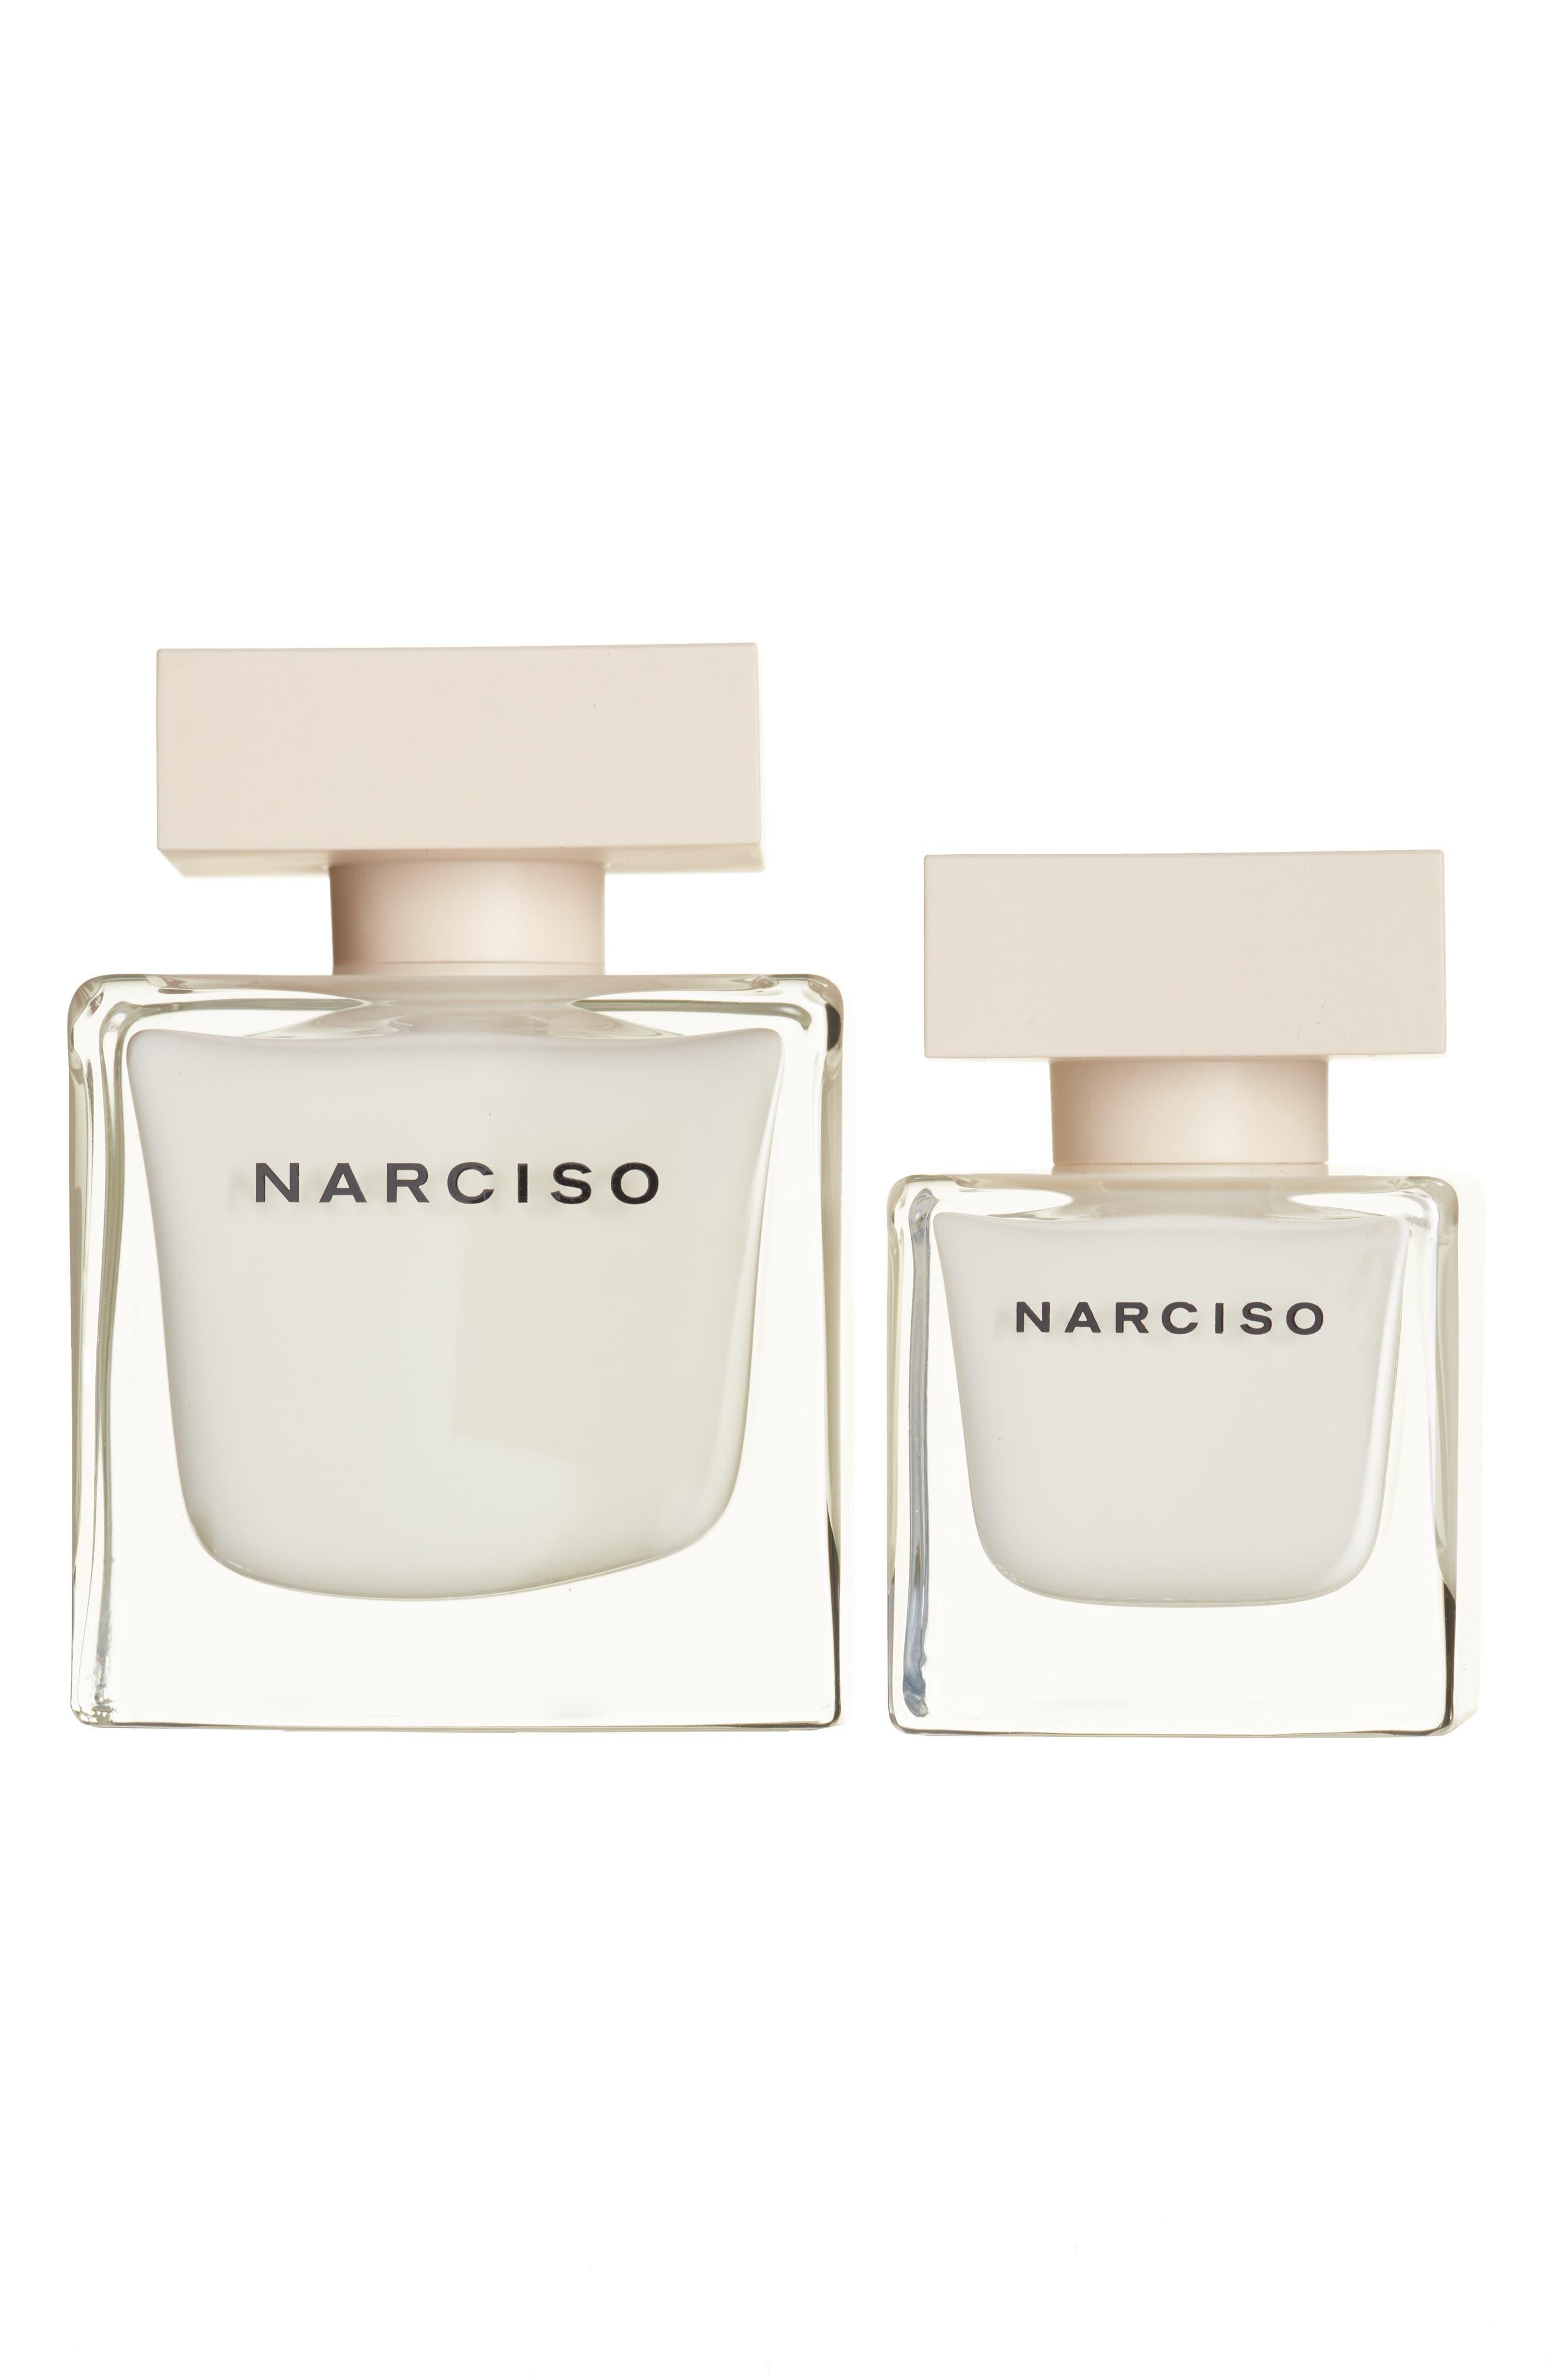 Main Image - Narciso Rodrigeuz Narciso Eau de Parfum Set ($177 Value)